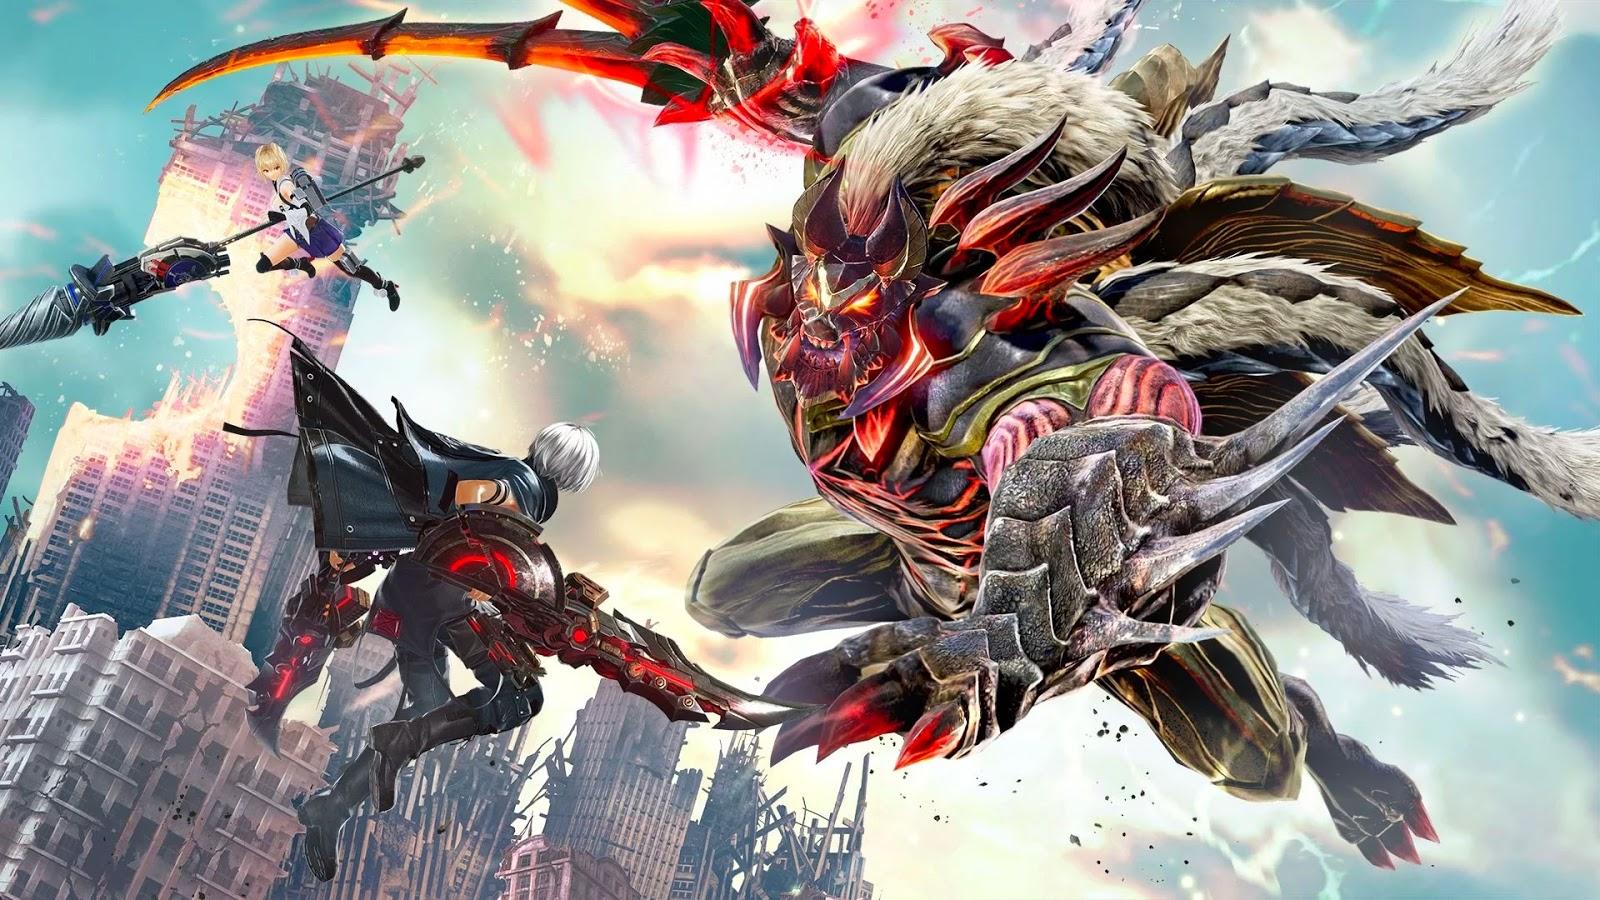 Análise: God Eater 3 (PS4/PC): Monster Hunter em versão anime (ou